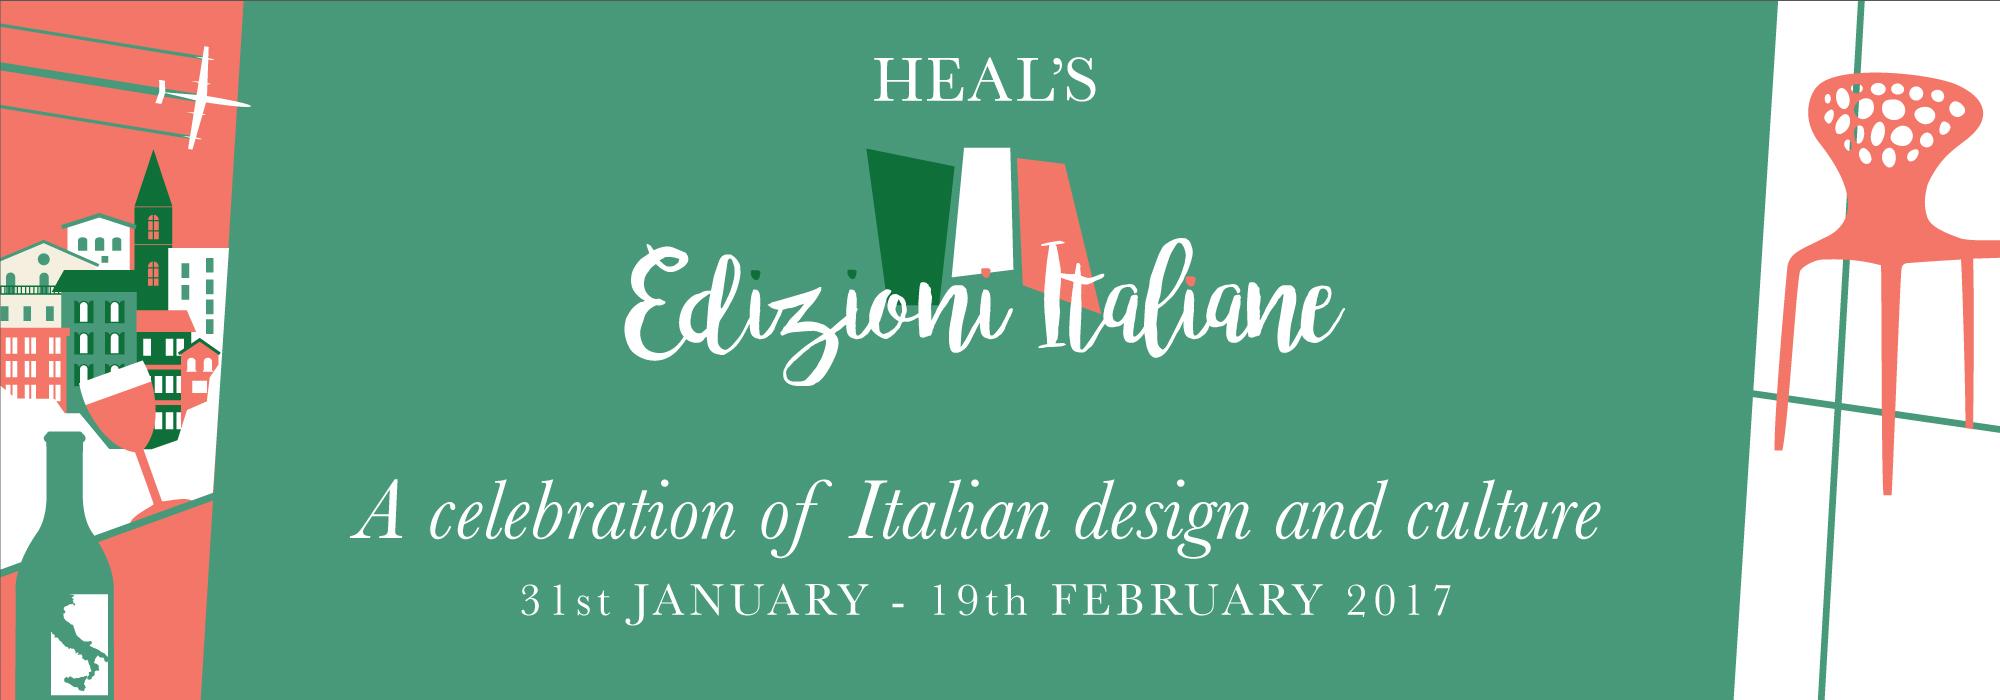 Heals-edizioni-italiane